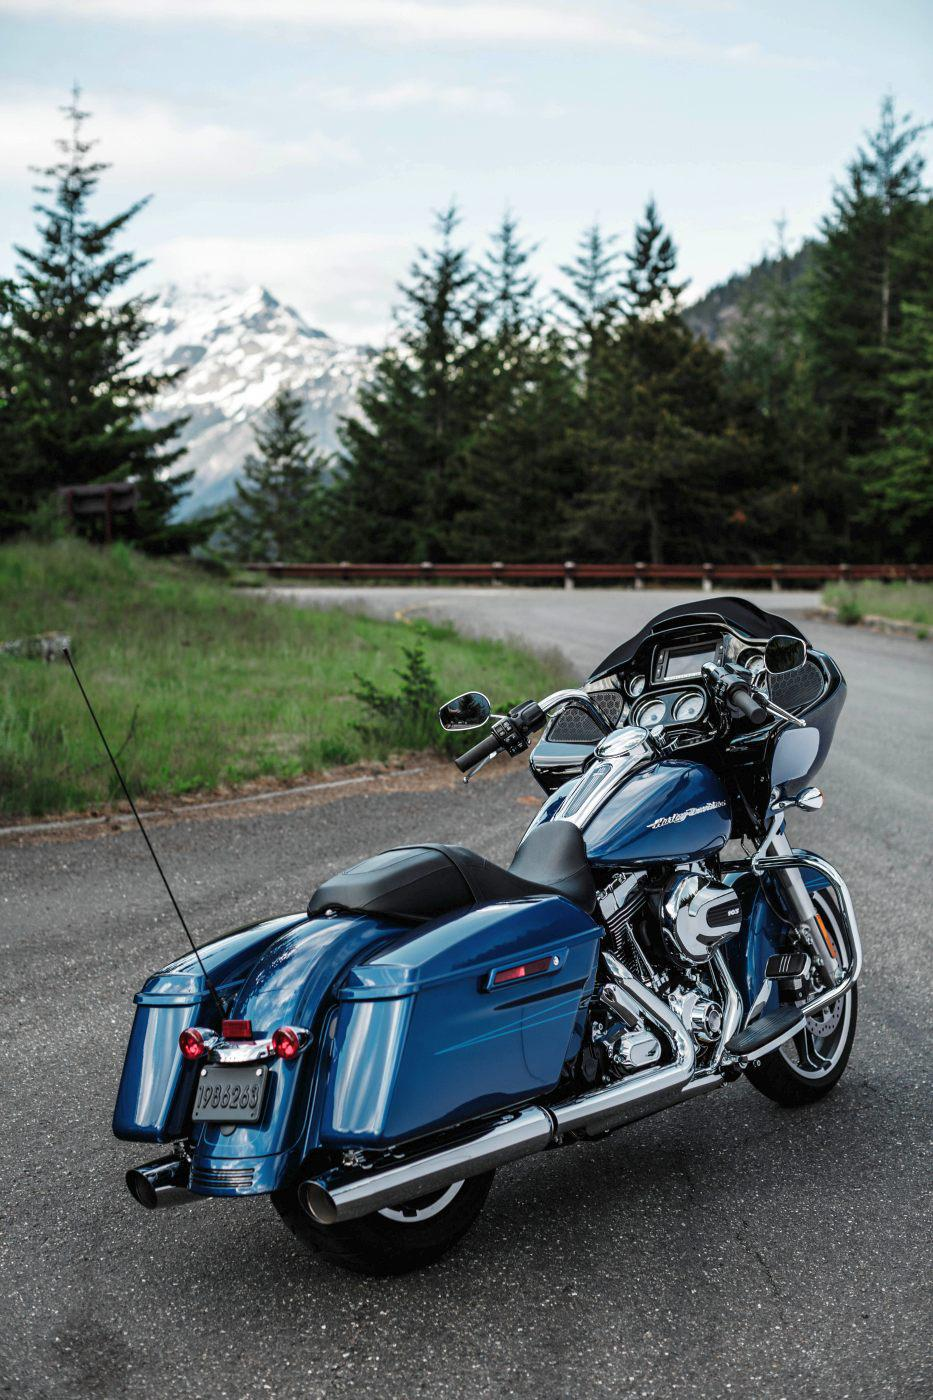 Harley Road Glide 2015 Modellnews